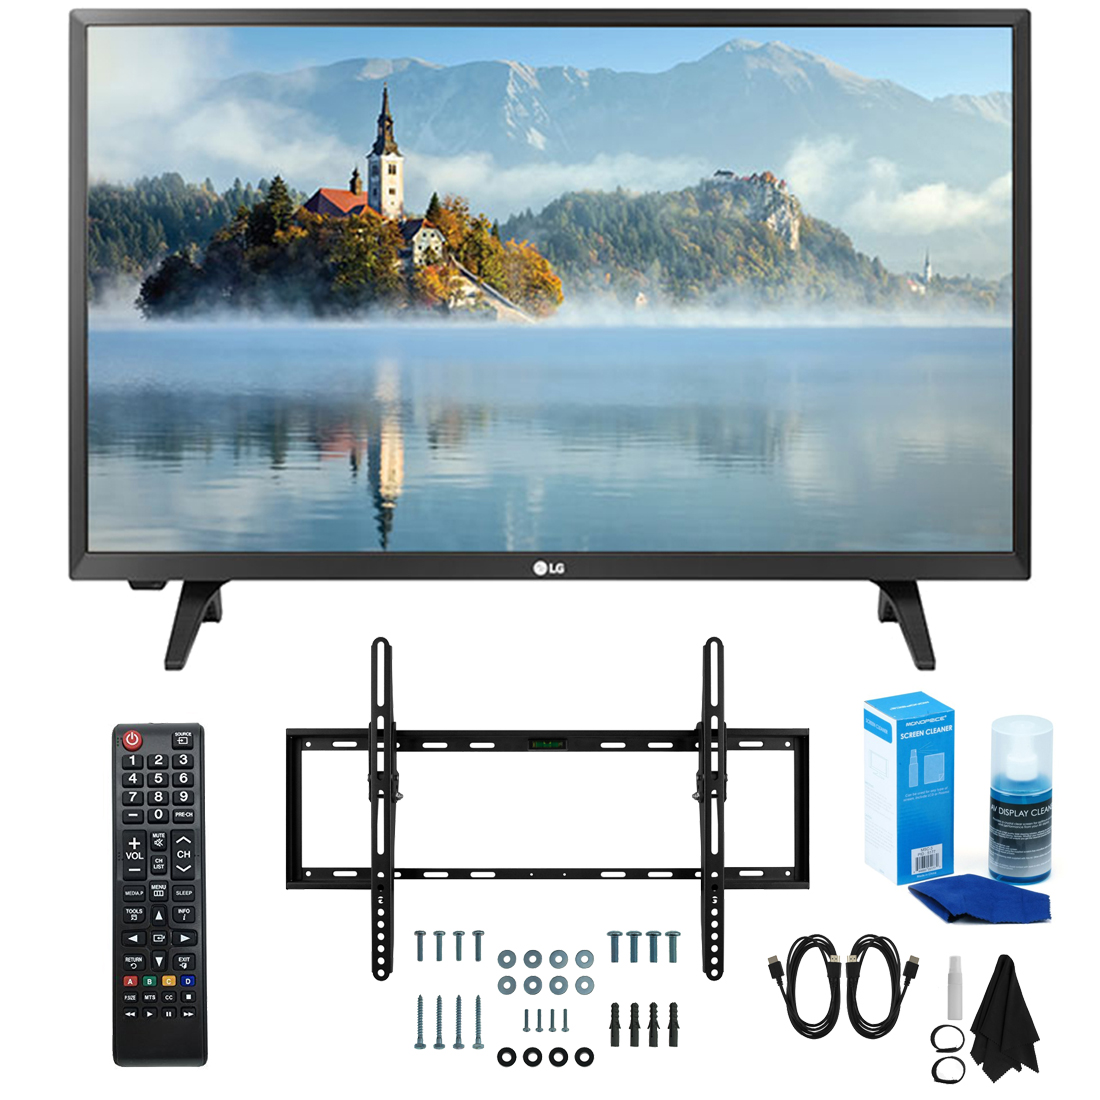 "LG 28LJ430B-PU 28"" Class HD 720p LED TV (2017 Model) with Slim Flat Wall Mount Kit and Professional Screen Cleaning Kit"